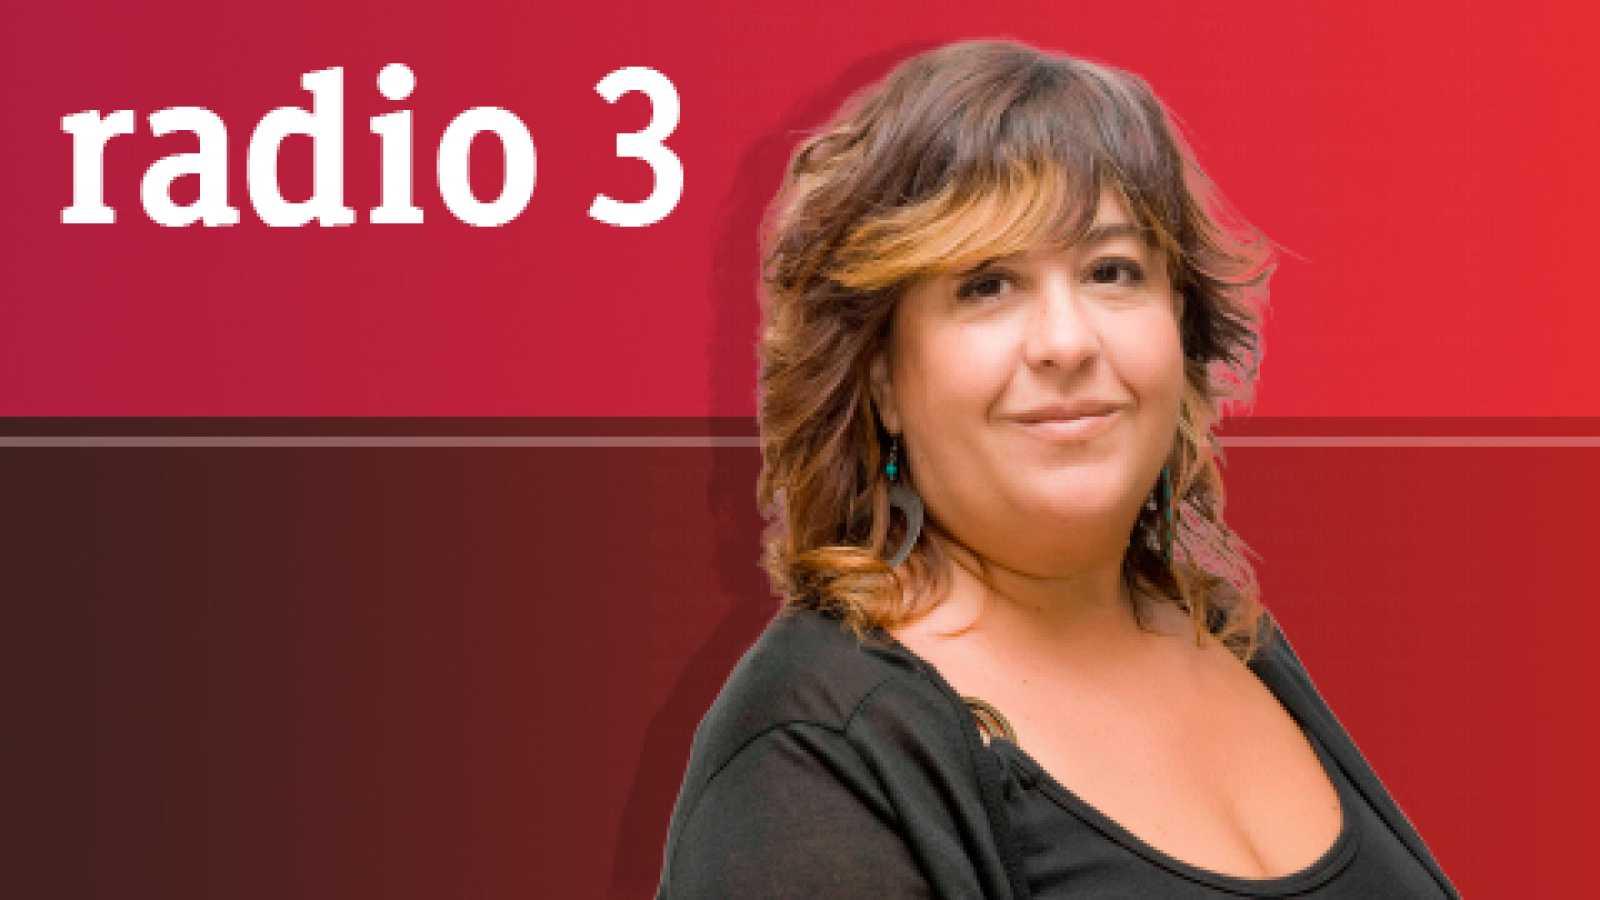 El gran quilombo - 08/08/20 - escuchar ahora